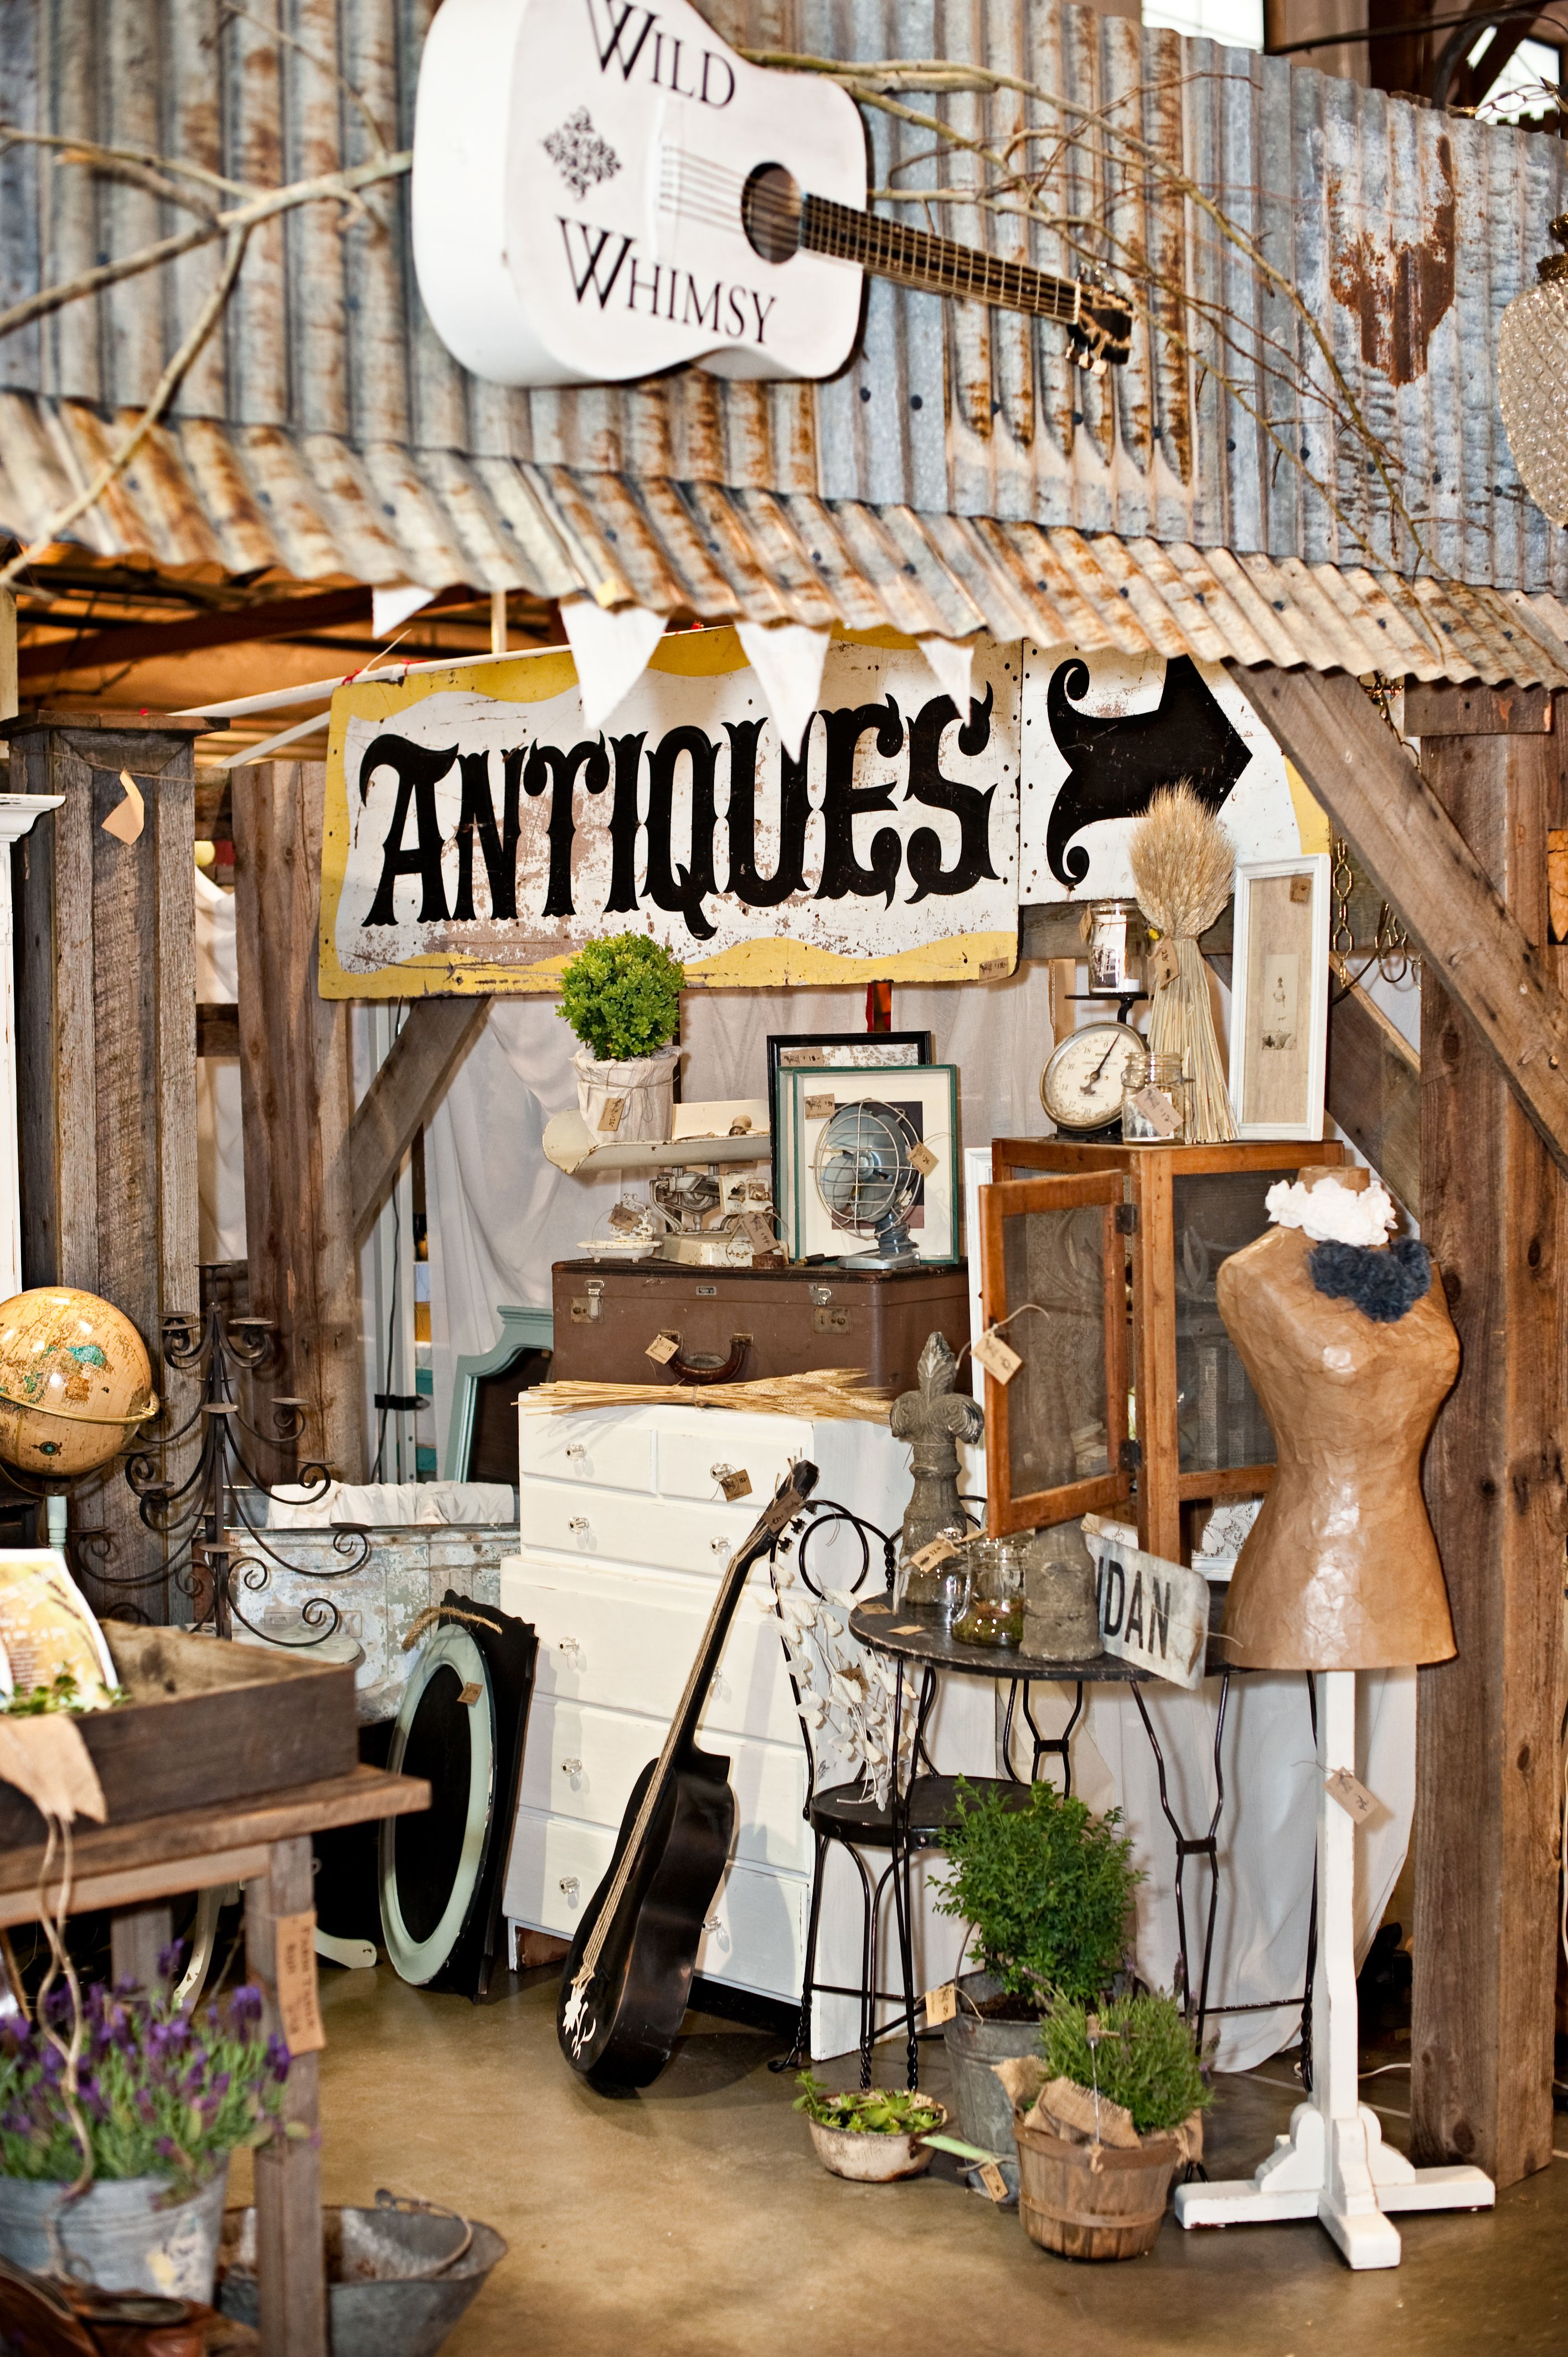 antique stores spokane wa From Farm Chicks antique show, Spokane Wa. Heading to this awesome  antique stores spokane wa